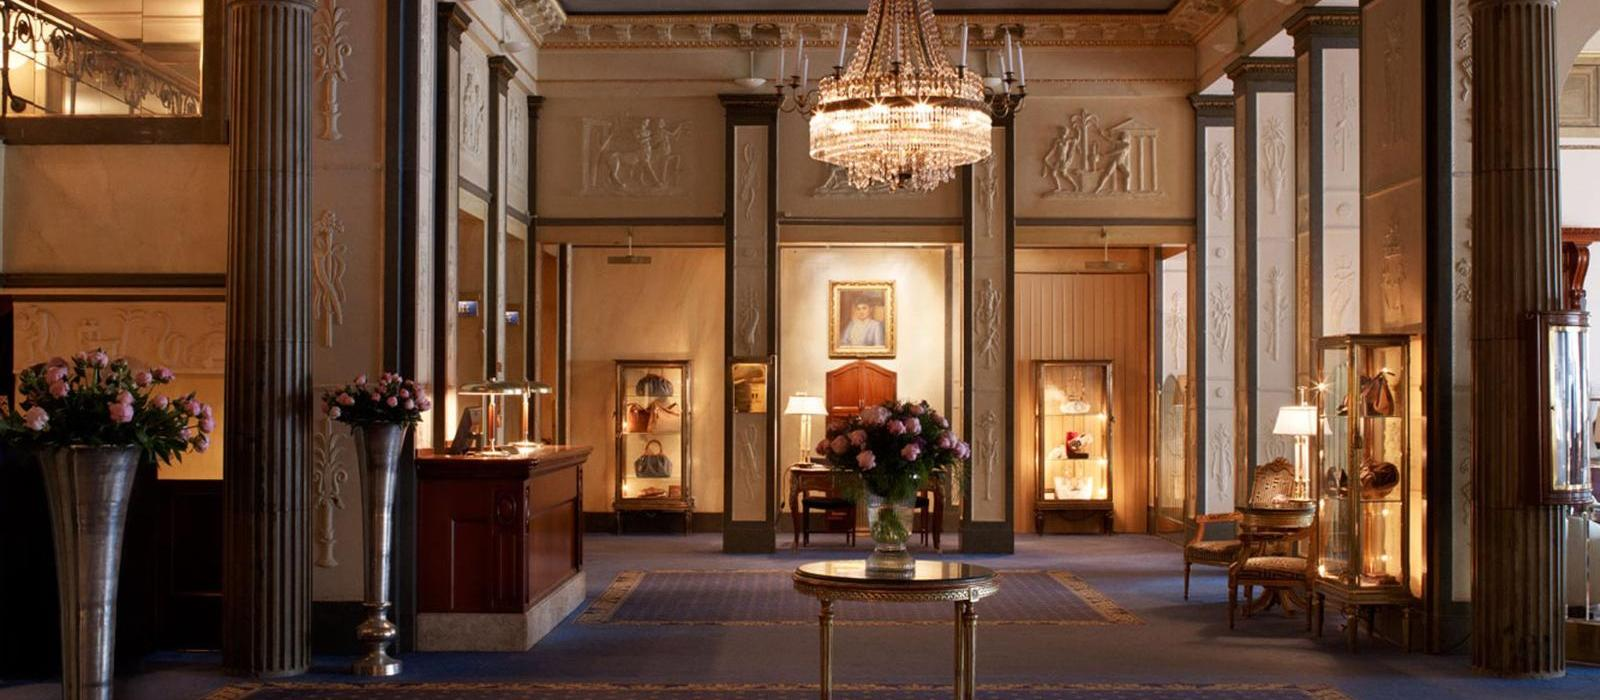 斯德哥尔摩大酒店(Grand Hotel Stockholm) 大堂图片  www.lhw.cn